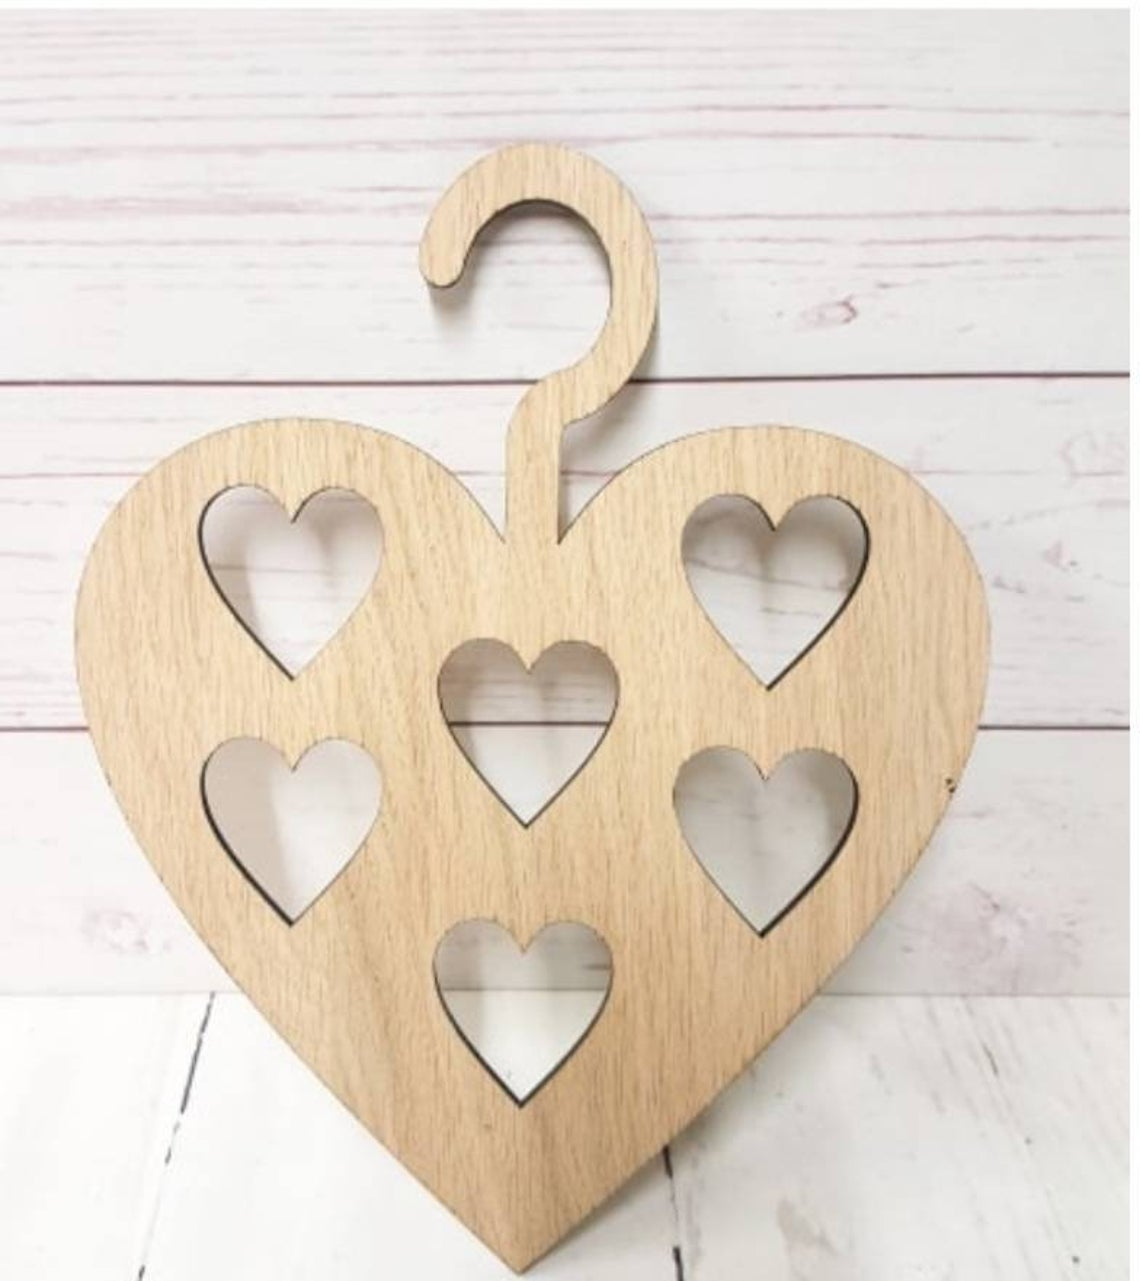 Laser Cut Heart Shaped Hanger Free CDR Vectors Art